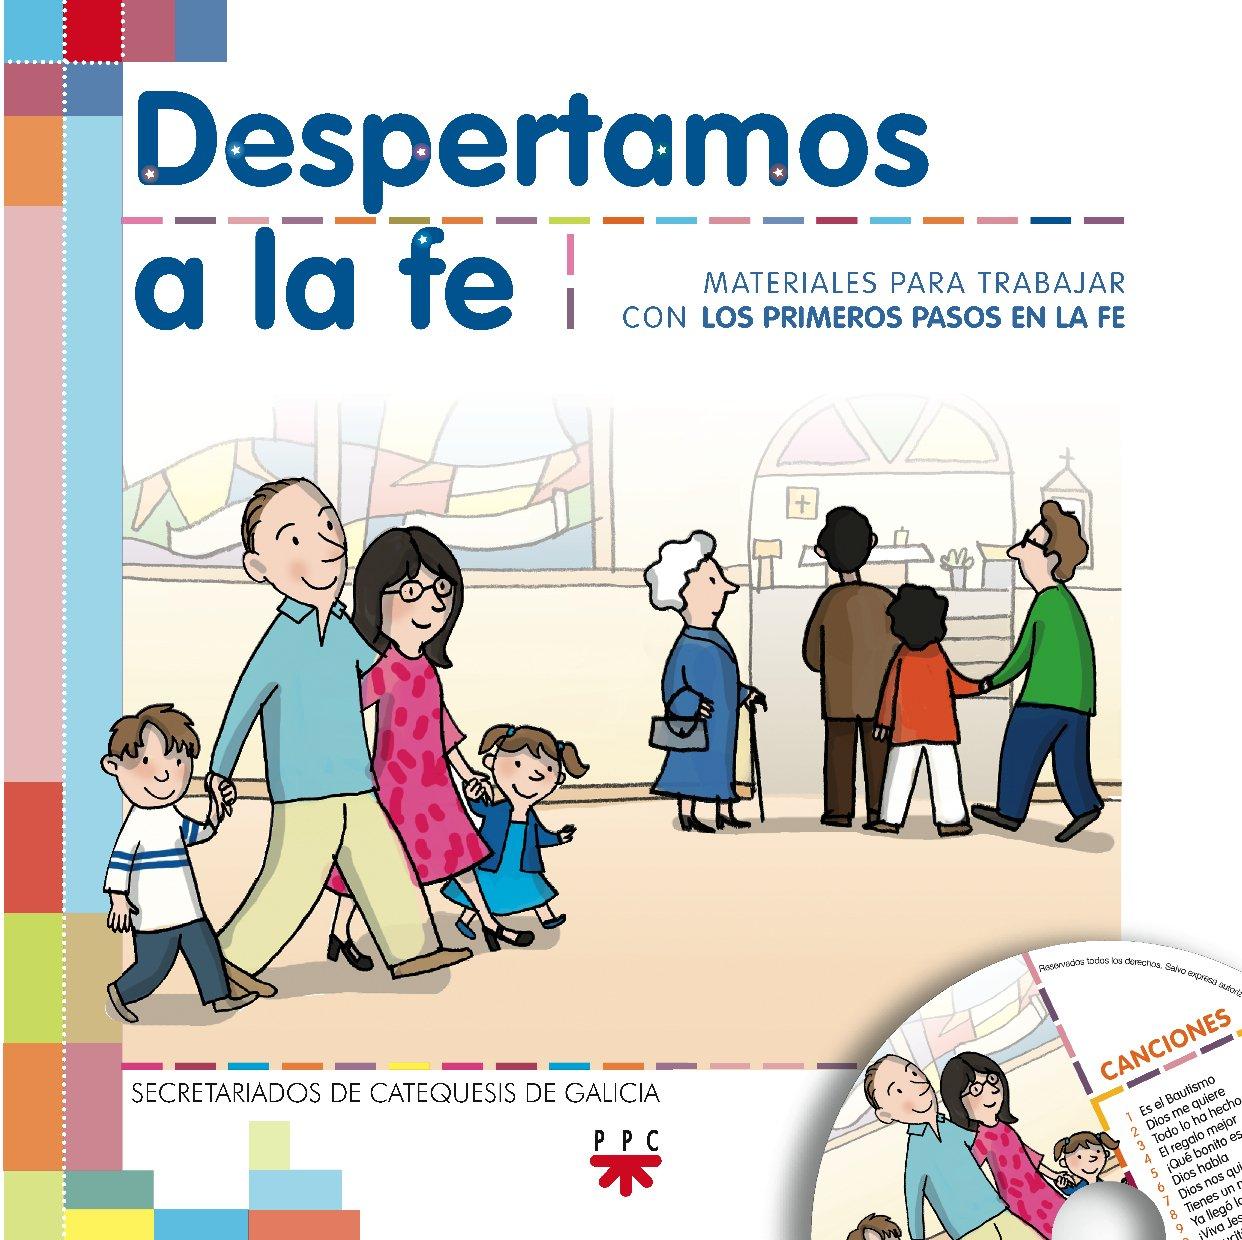 Despertamos A La Fe (Catequesis Galicia): Amazon.es: Secretariados de Catequesis de Galicia,: Libros